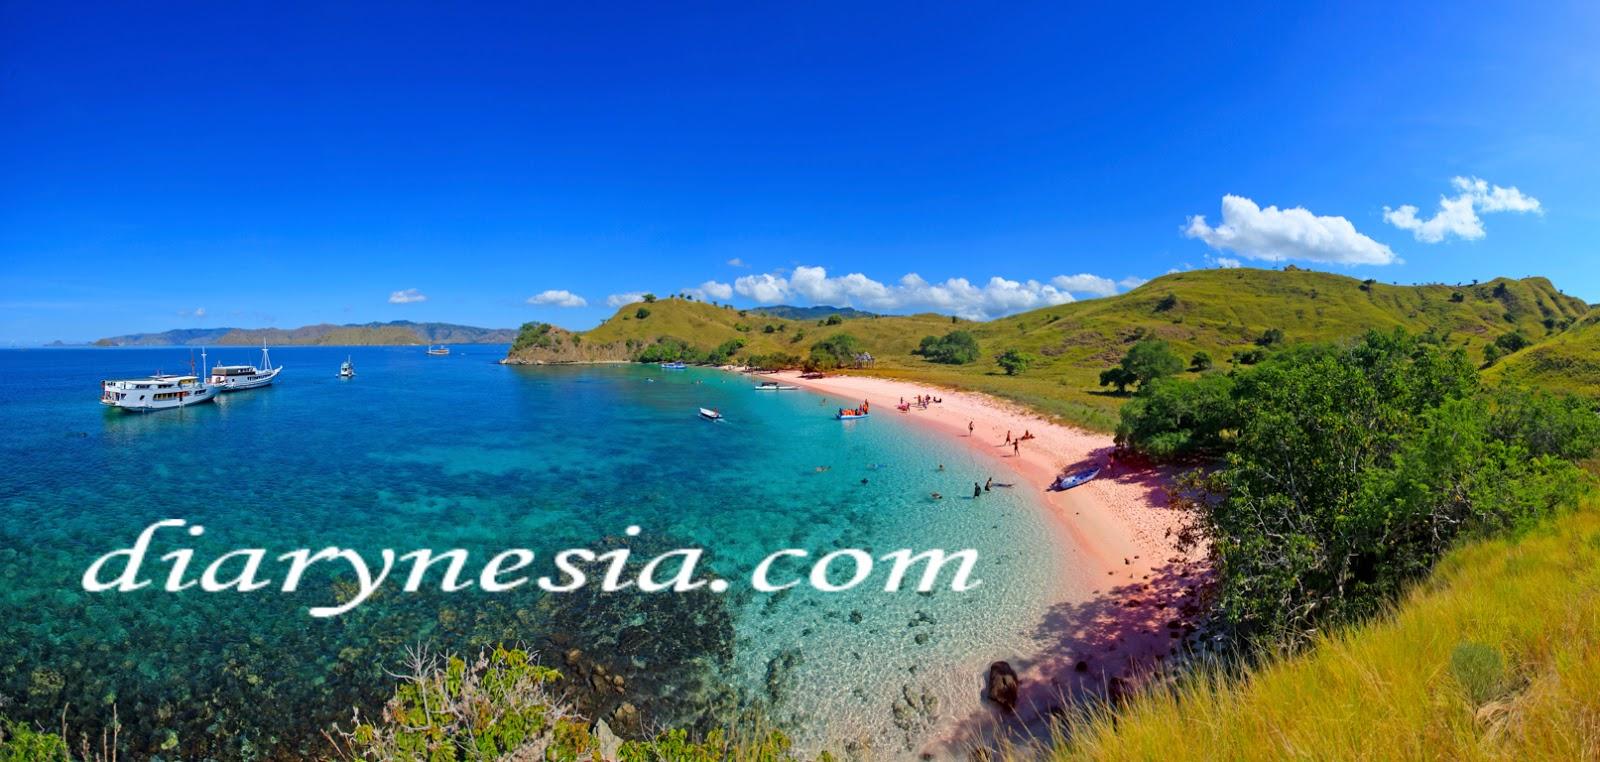 komodo national park must visit destination, east nusa tenggara tourism, pink beach tourist destination, diarynesia